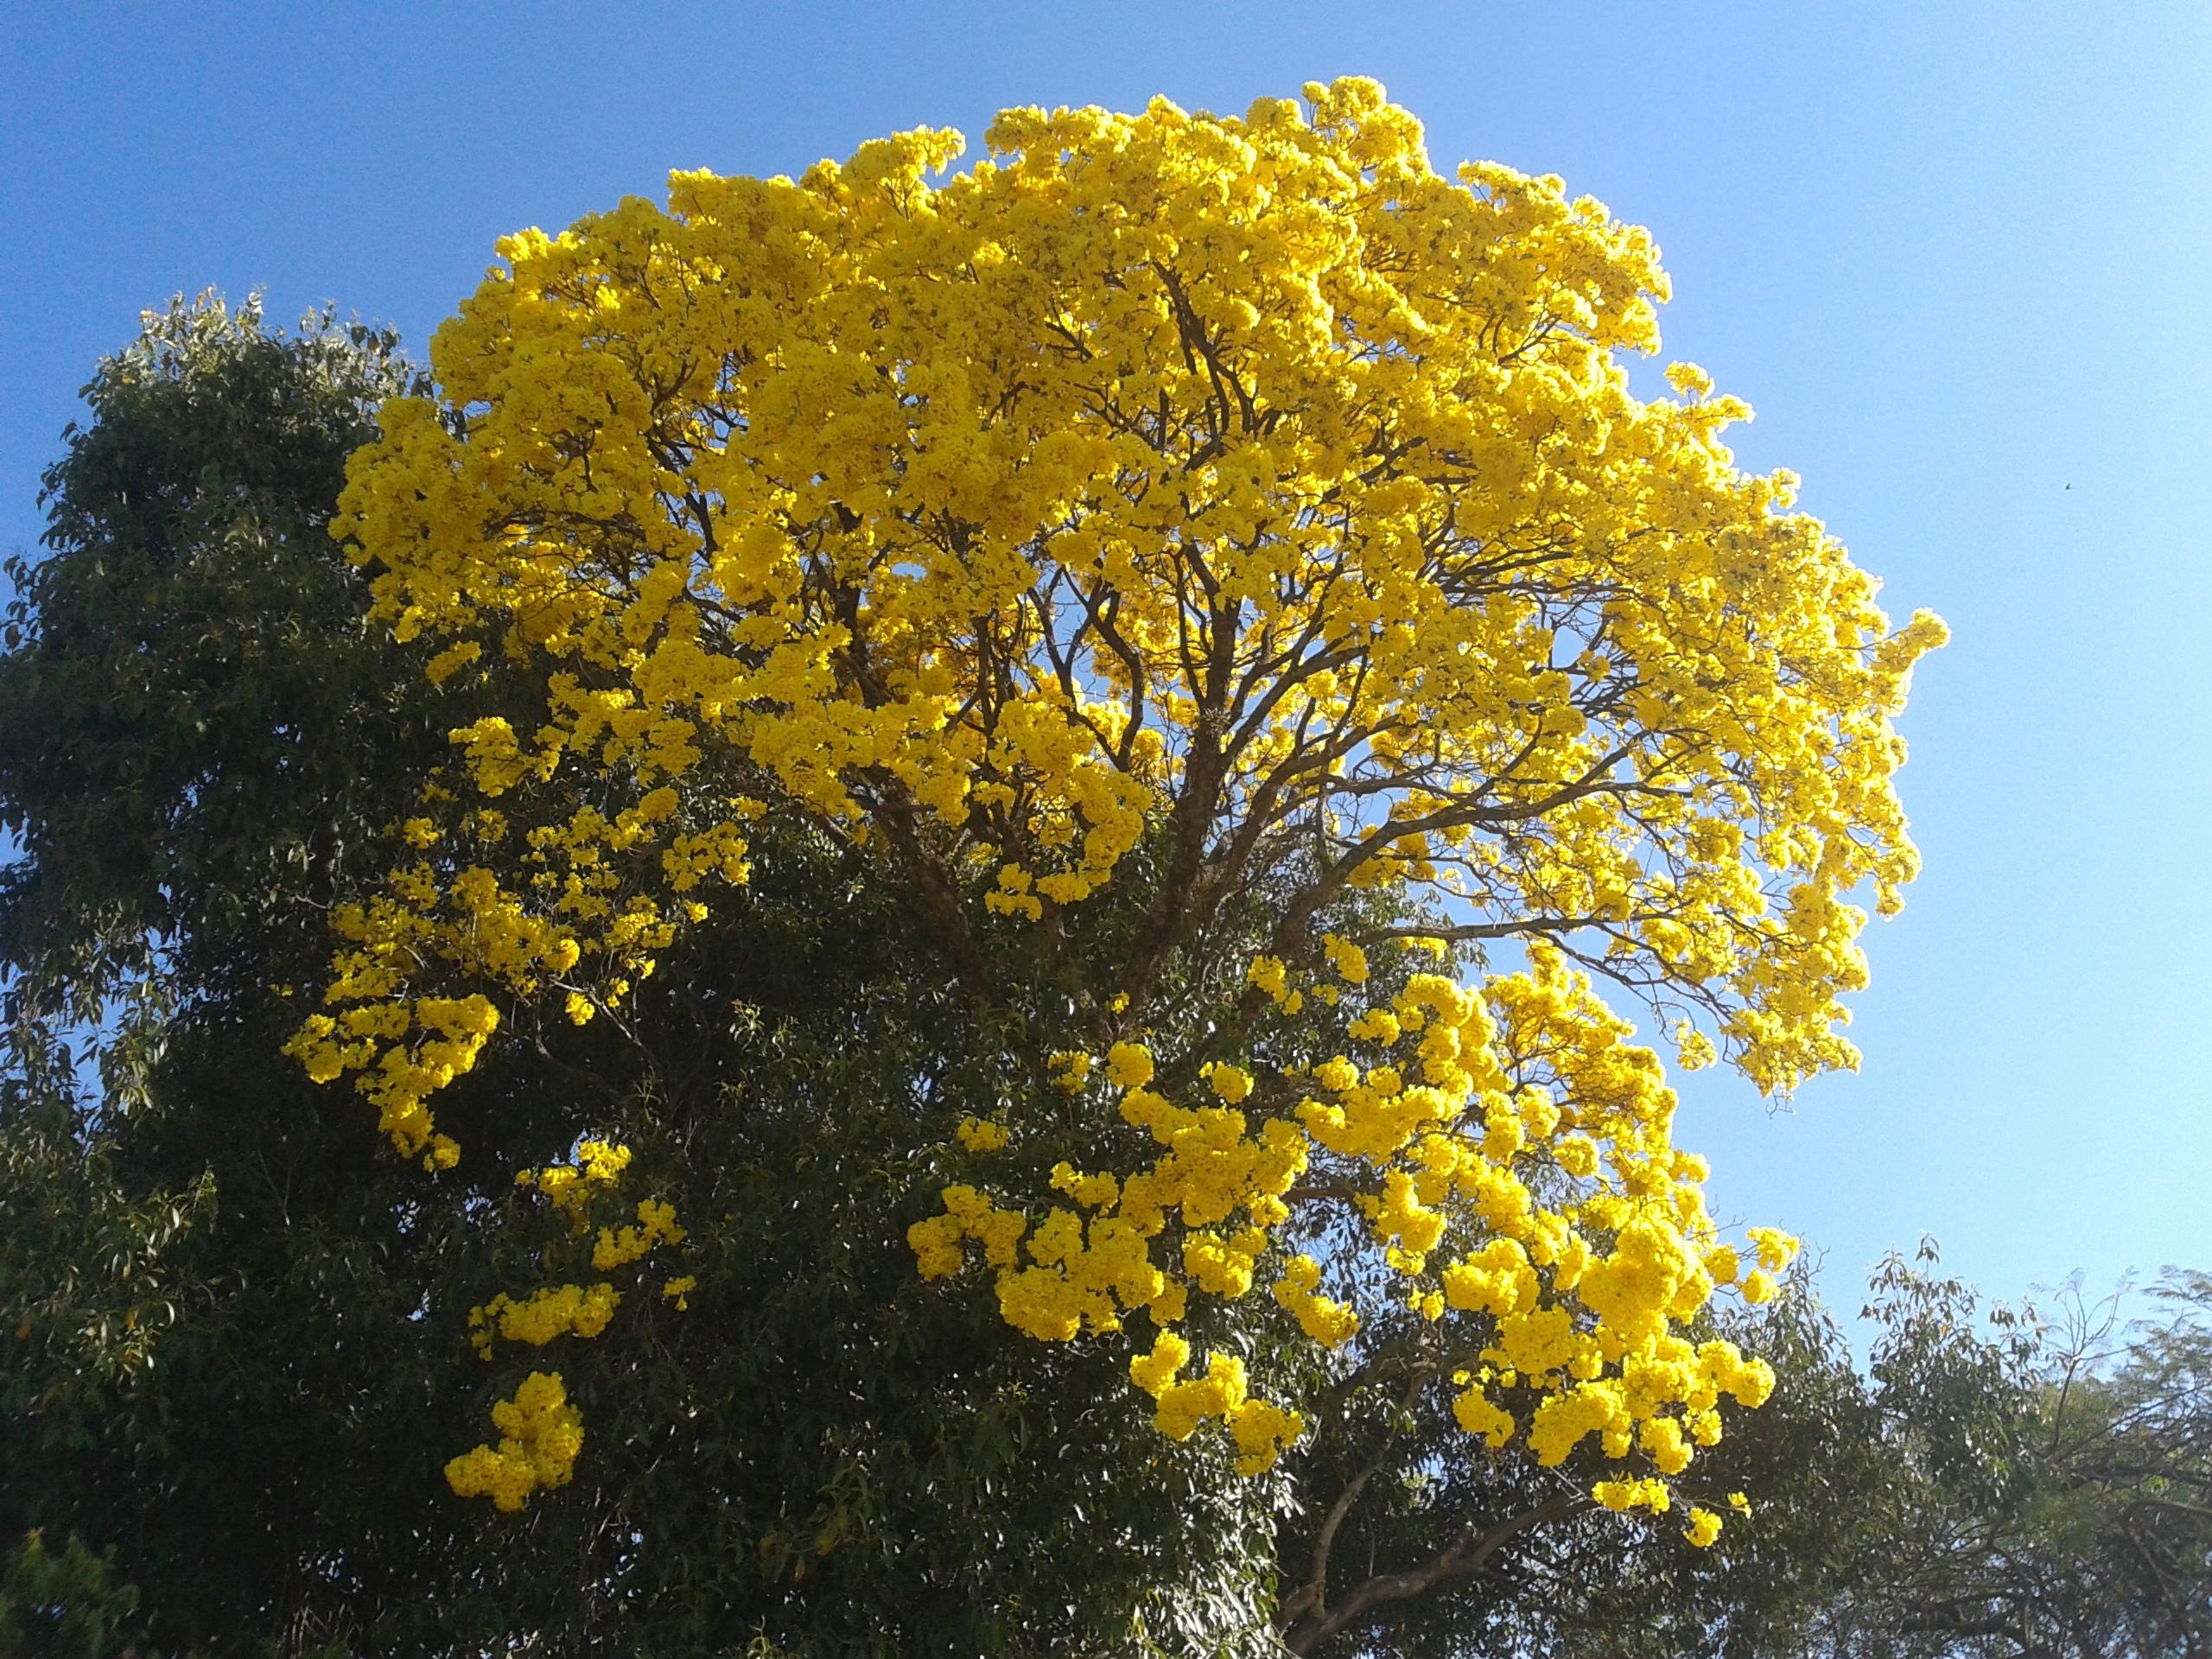 tabebua en fleurs jaunes